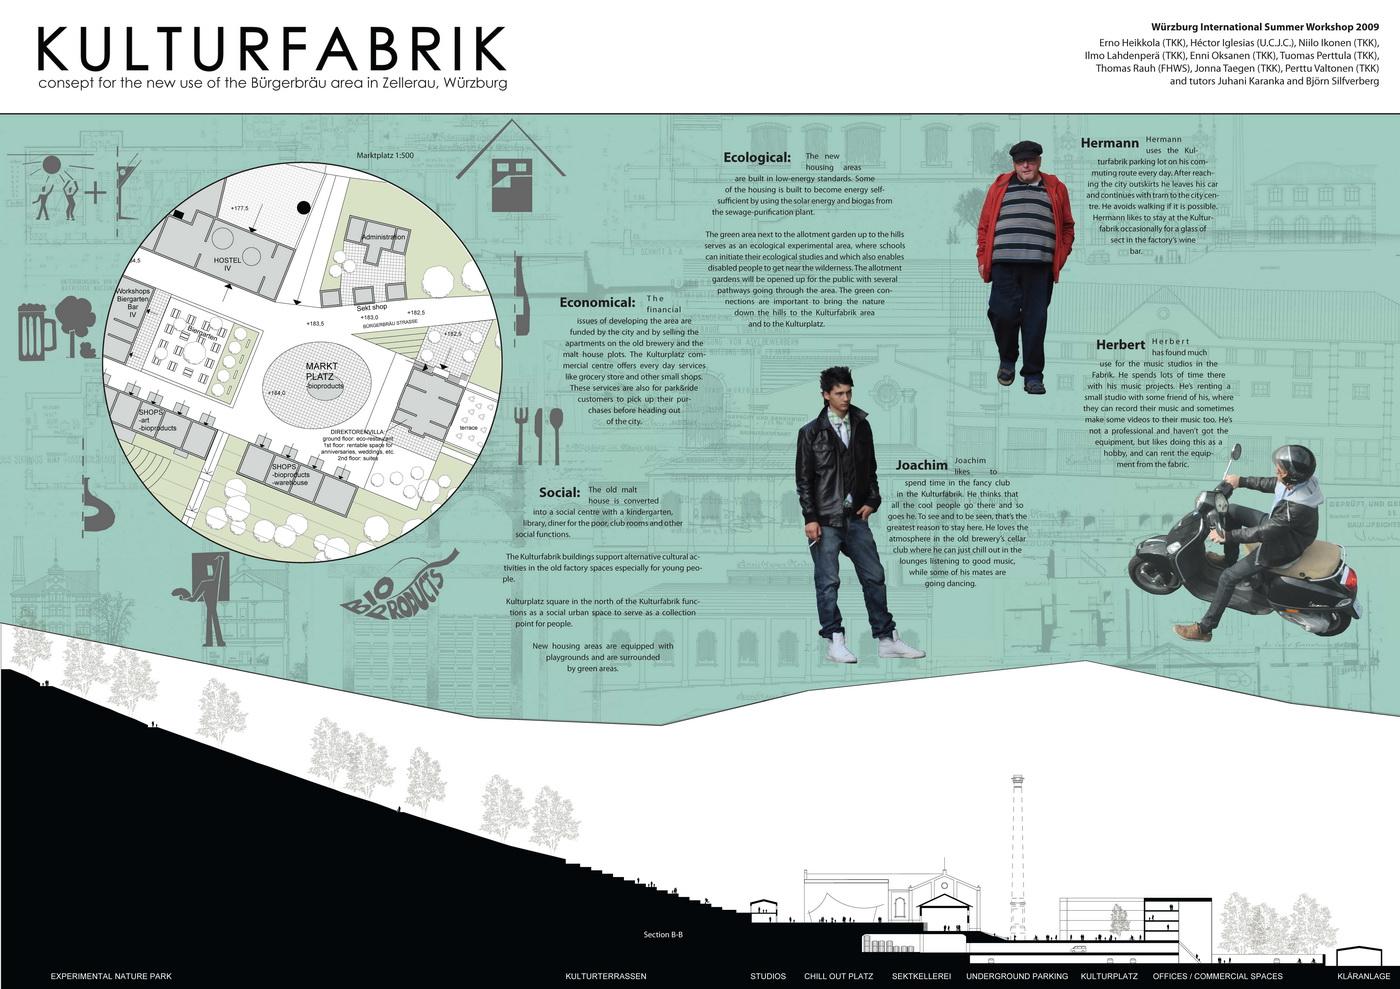 kulturfabrik_2